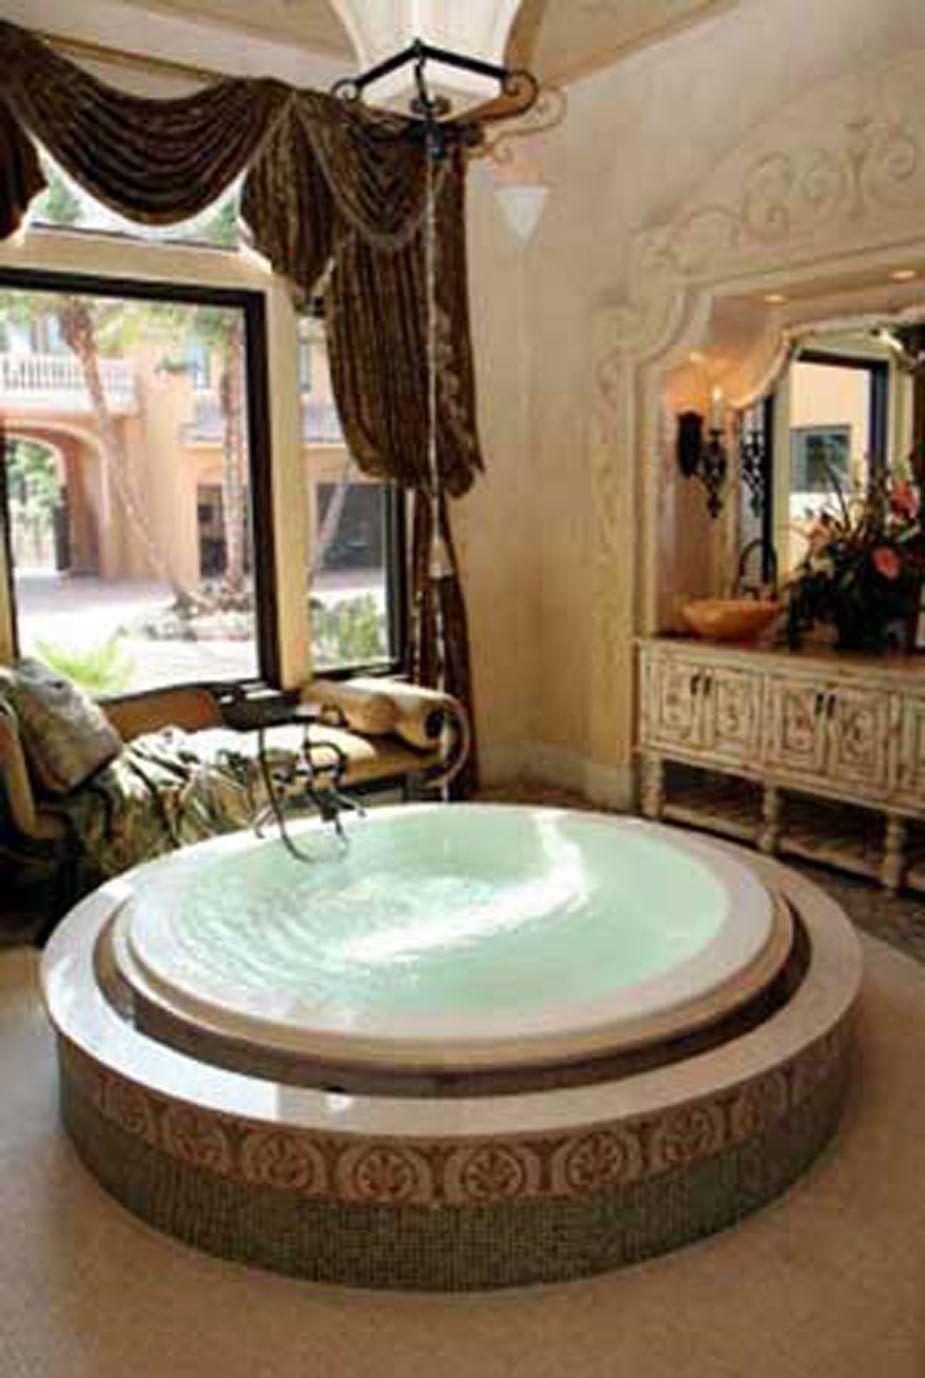 Www Facebook Lazienkizpomyslem Miska łazienka Ro Bath Bathroom Interior Idea Decoration Romance Relaxation Love